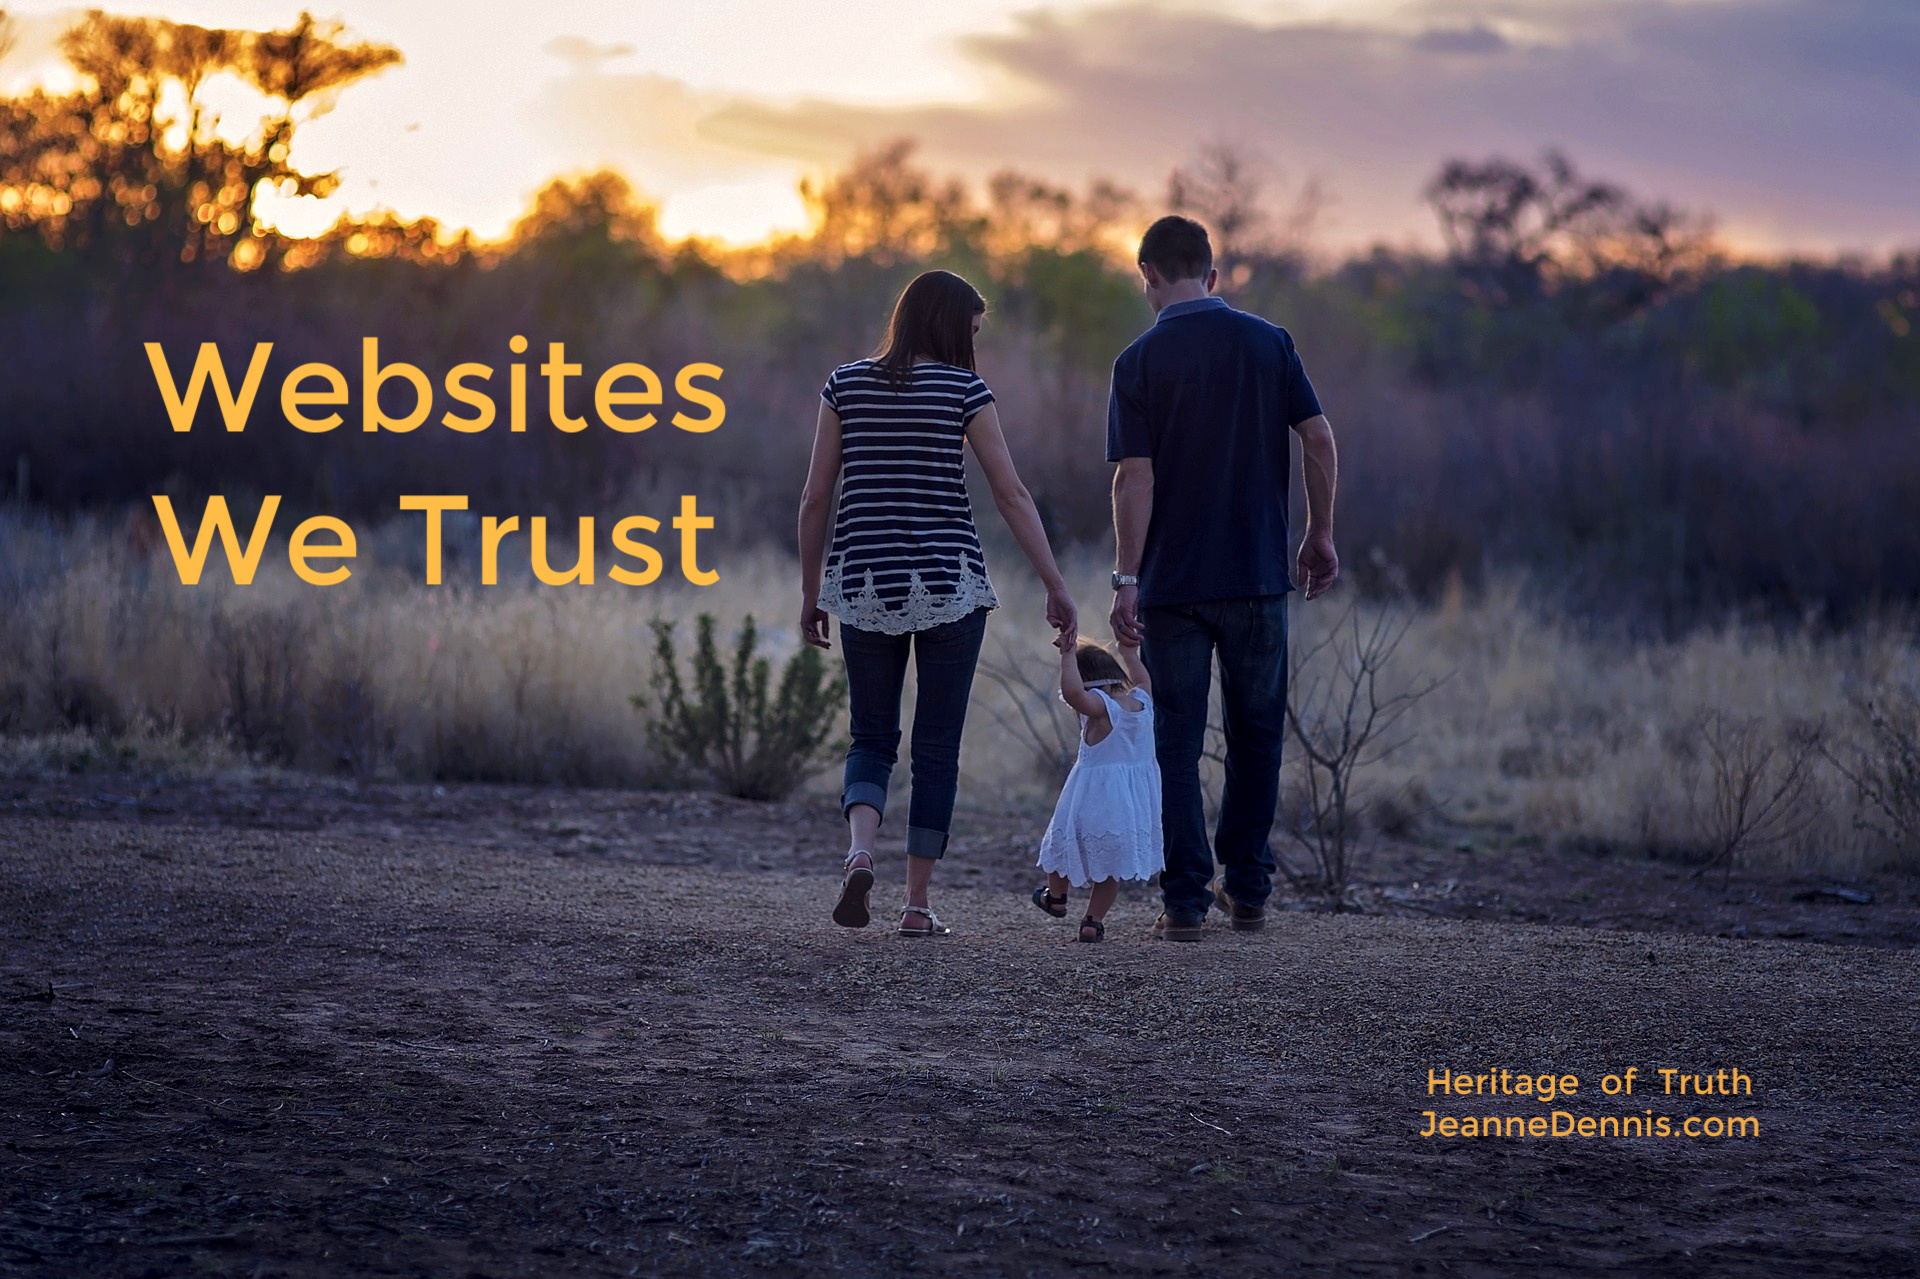 Websites We Trust, Heritage of Truth, JeanneDennis.com